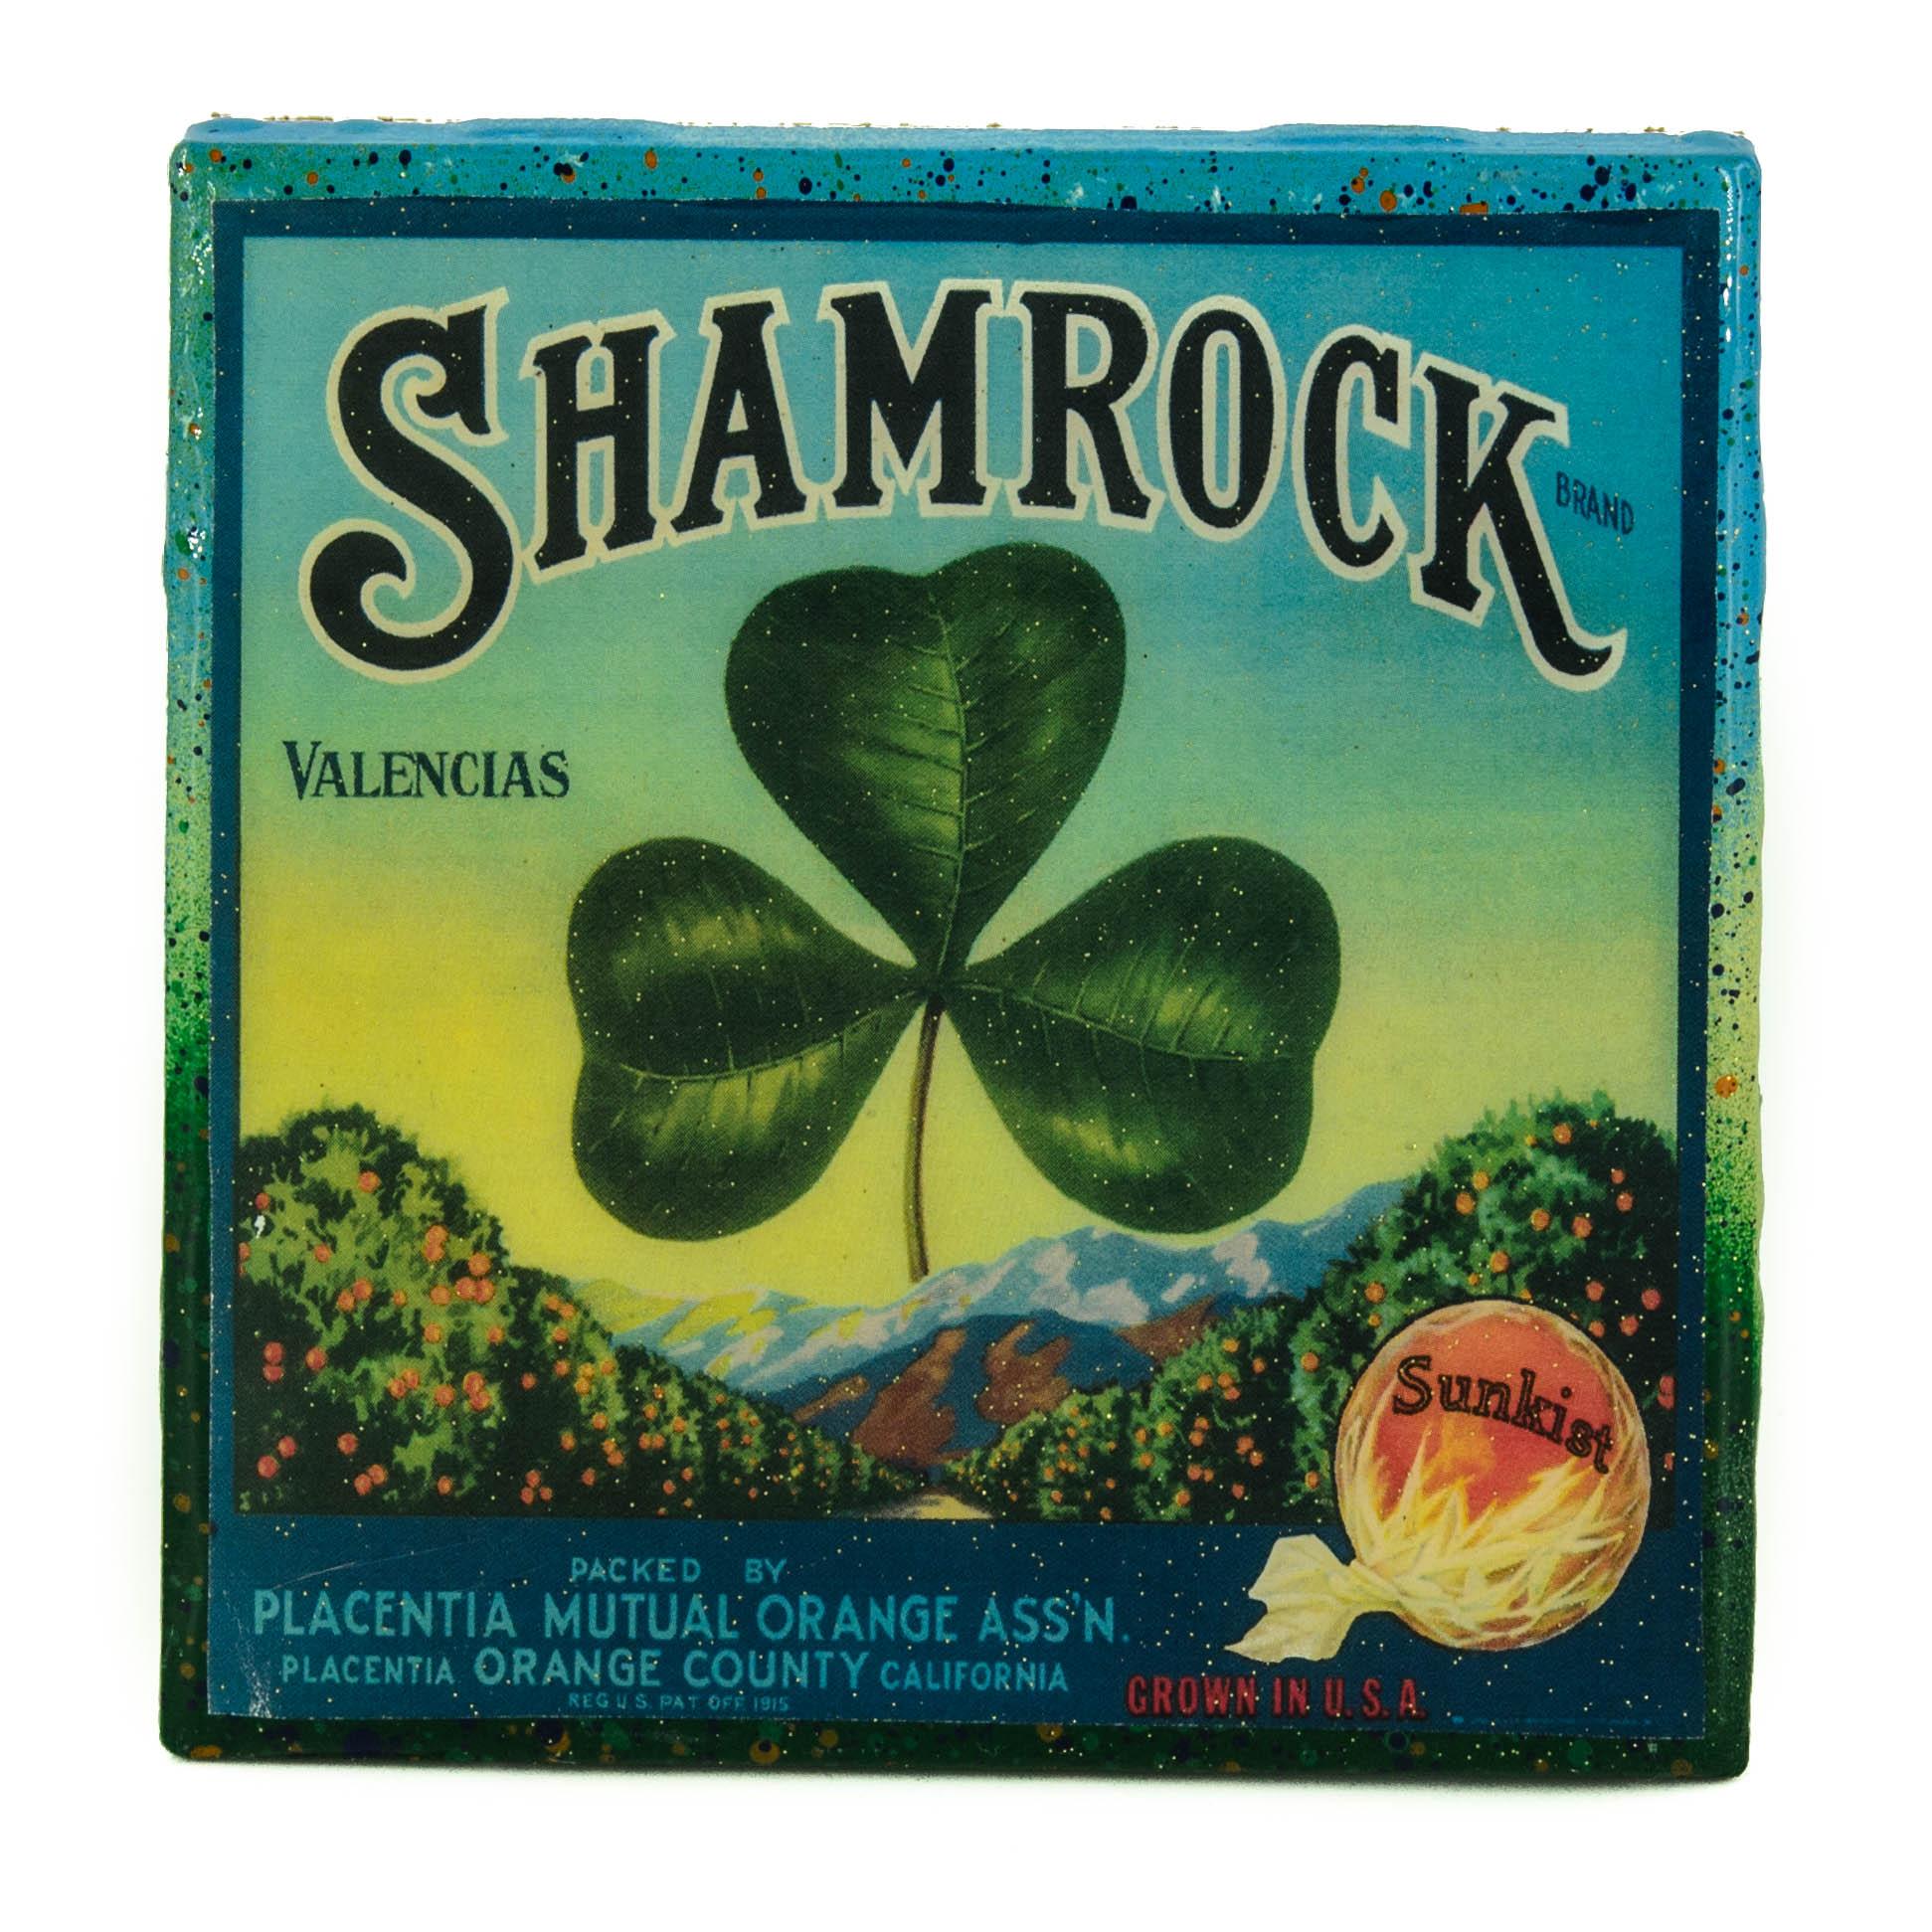 Uncategorized Shamrock History stella divina shamrock vintage citrus crate label handmade recycled tile coaster thumbnail 1